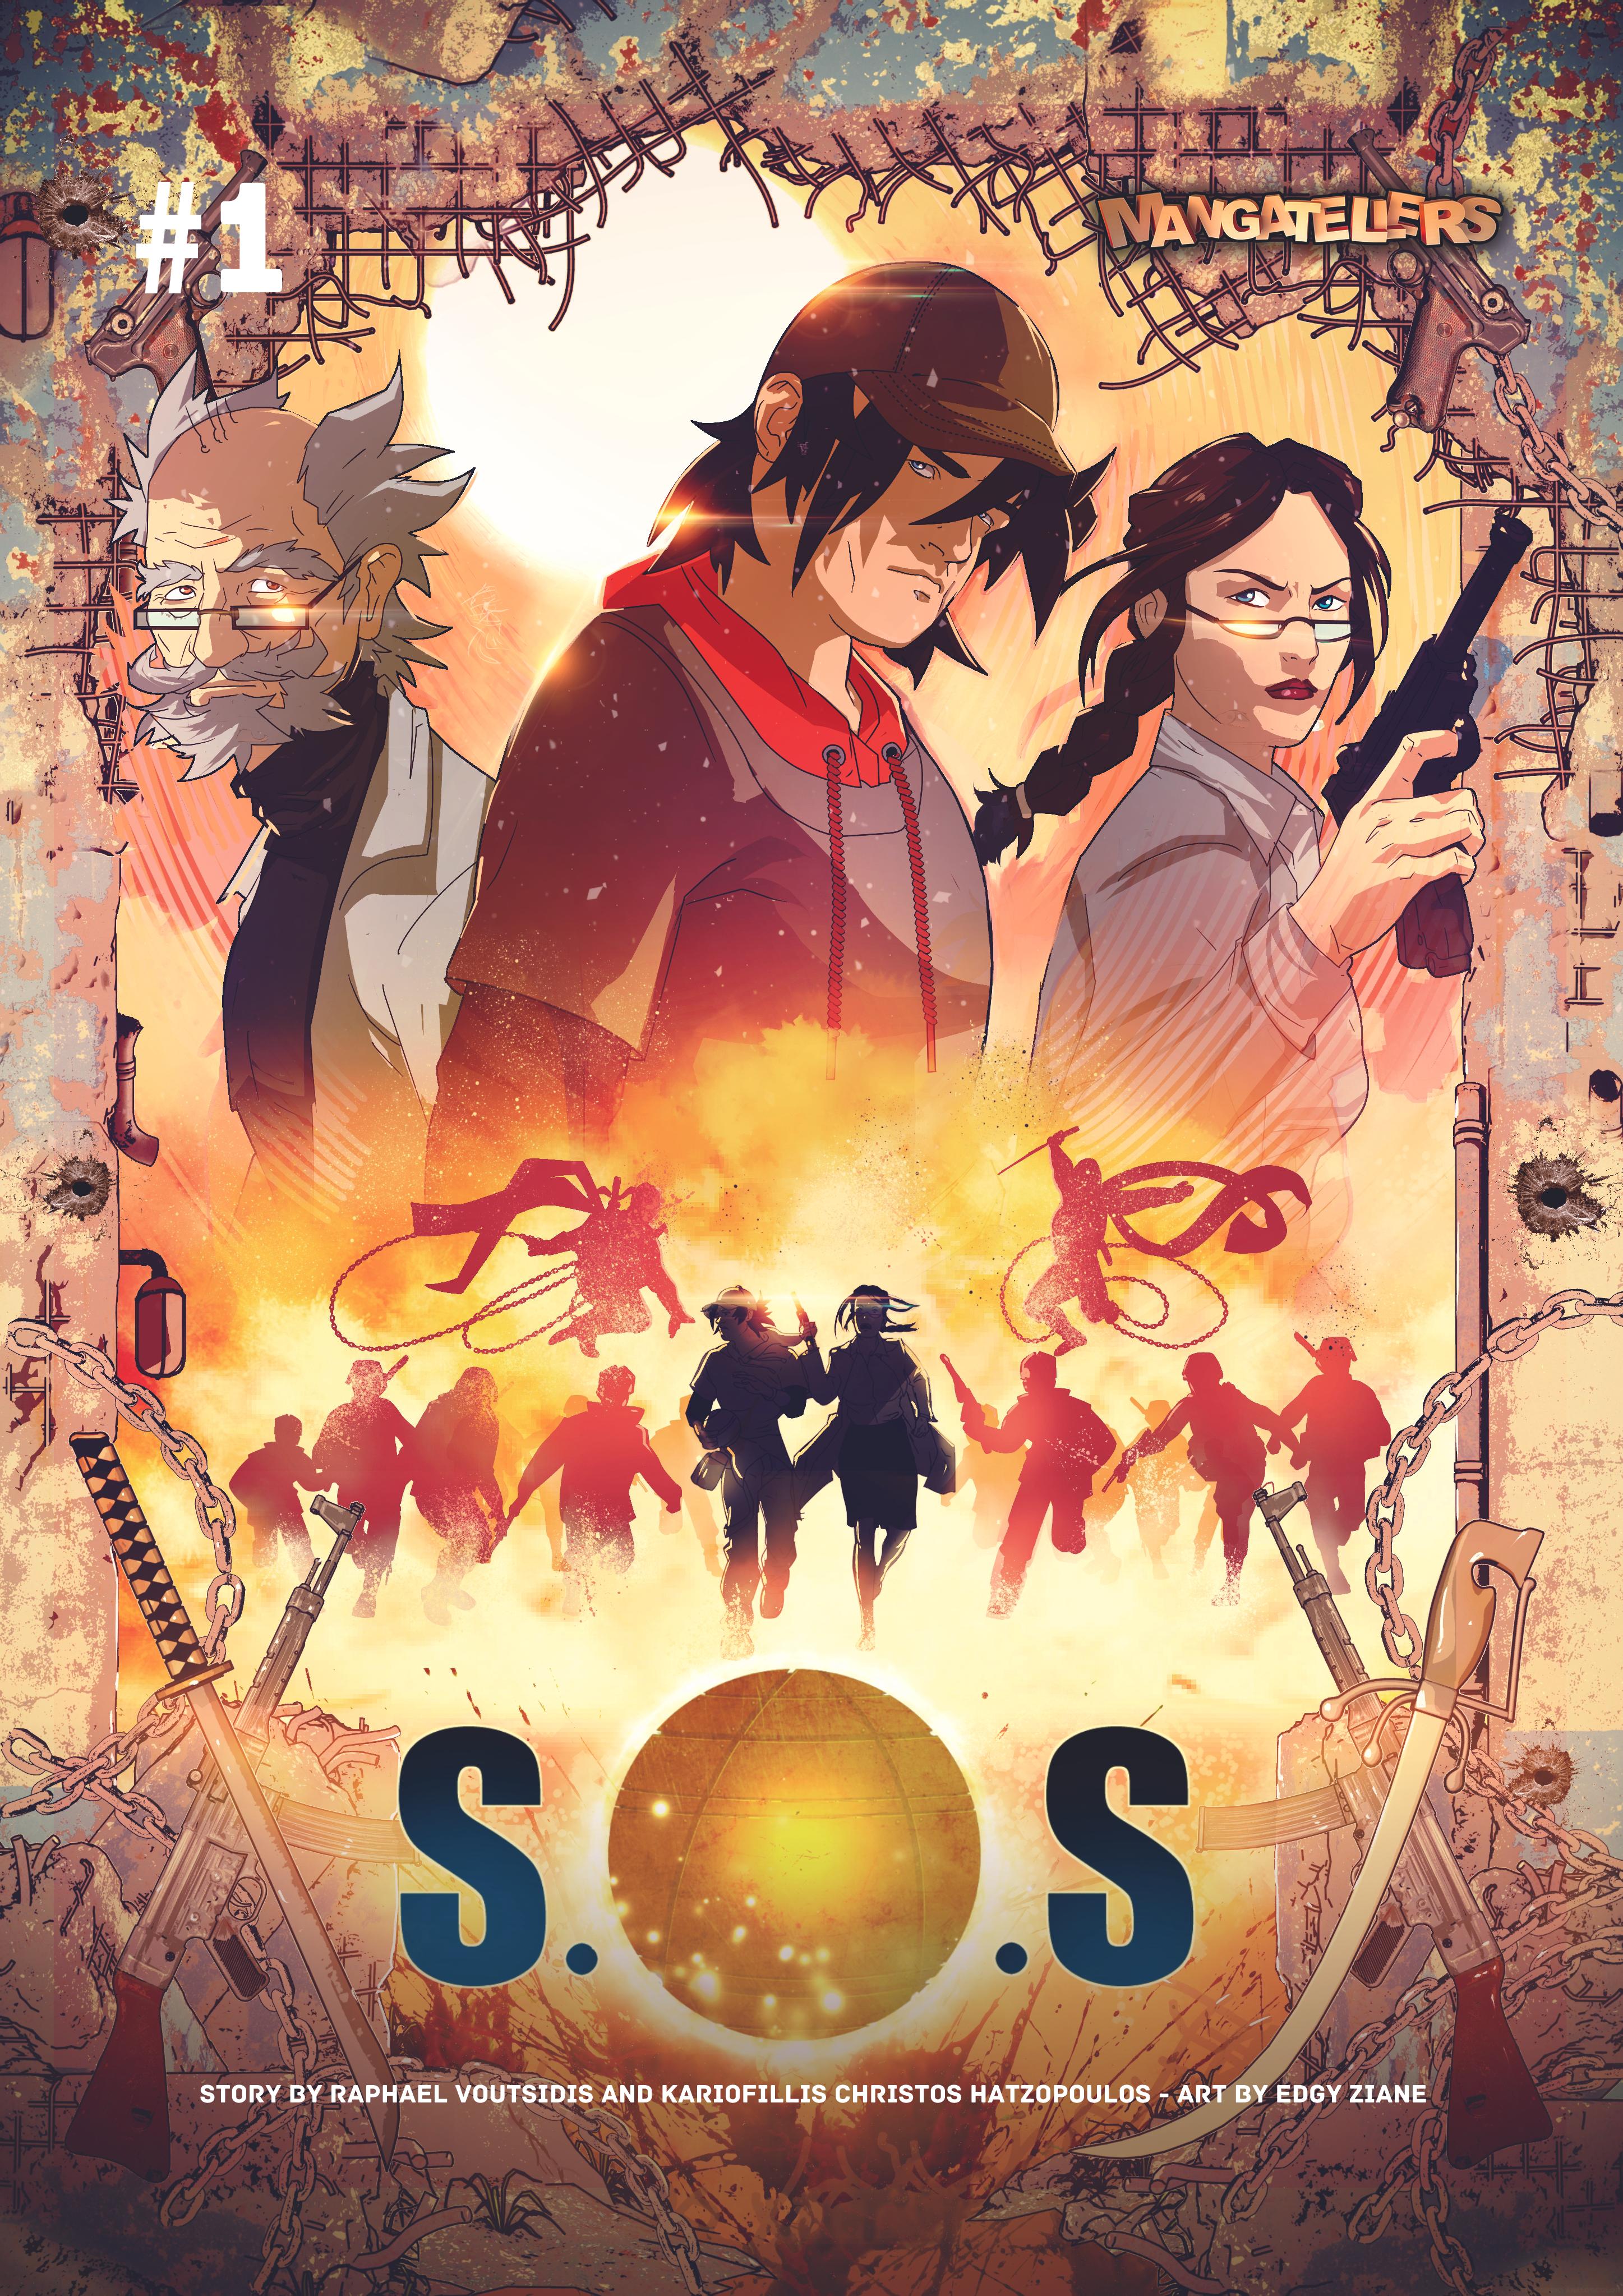 Sphere of Salvation Tankoubon Cover by Mangatellers